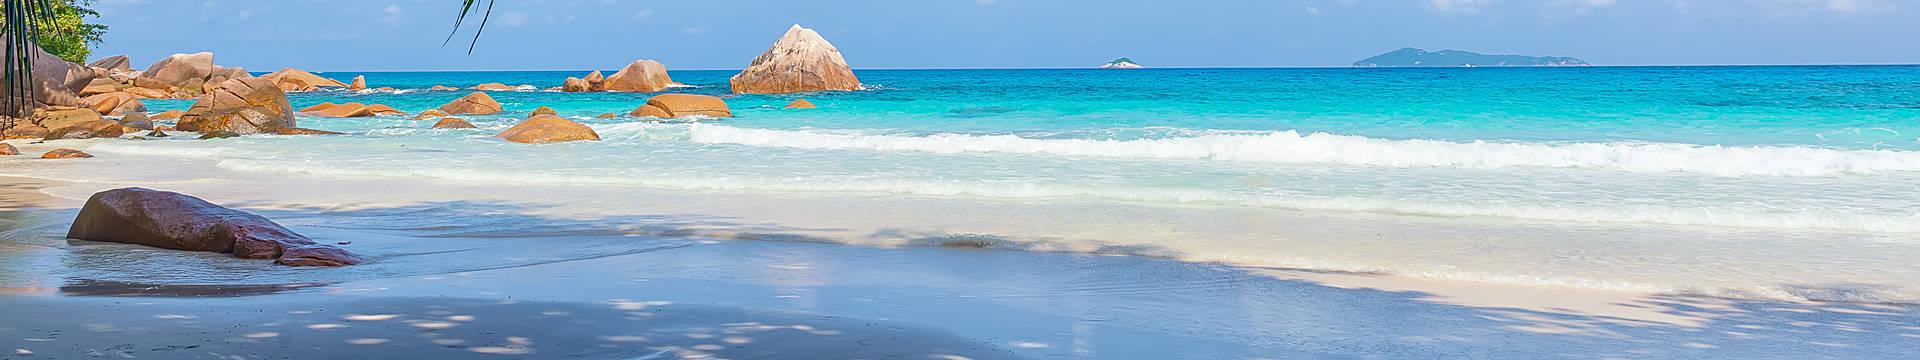 Viaggi alle Seychelles